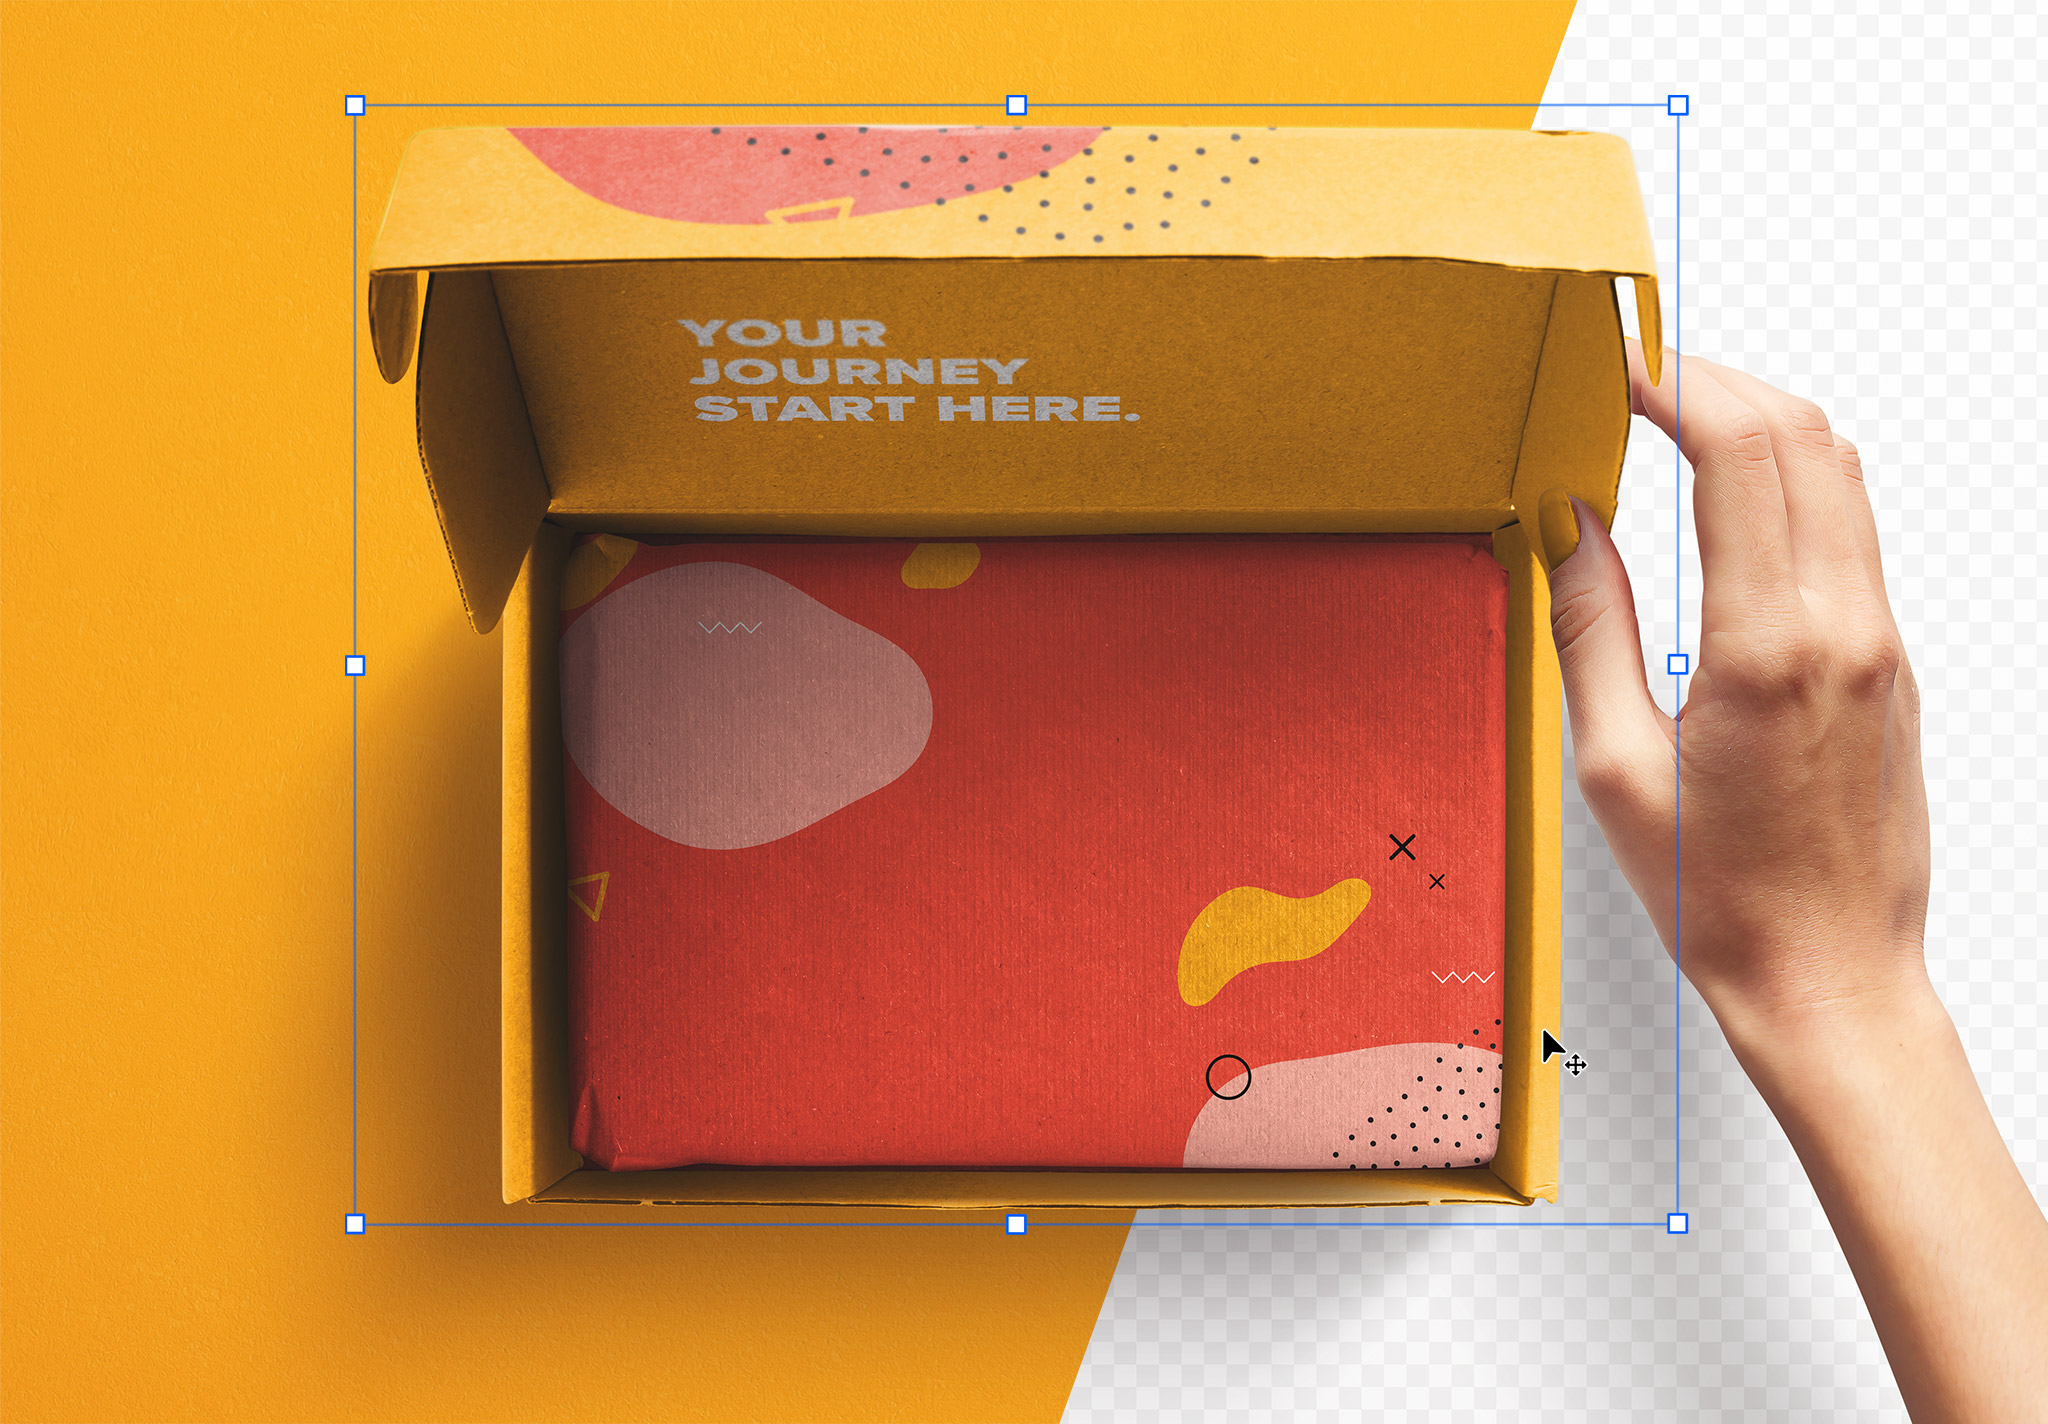 Hand Holding Opened Postal Box Lid Mockup thumbnail 2